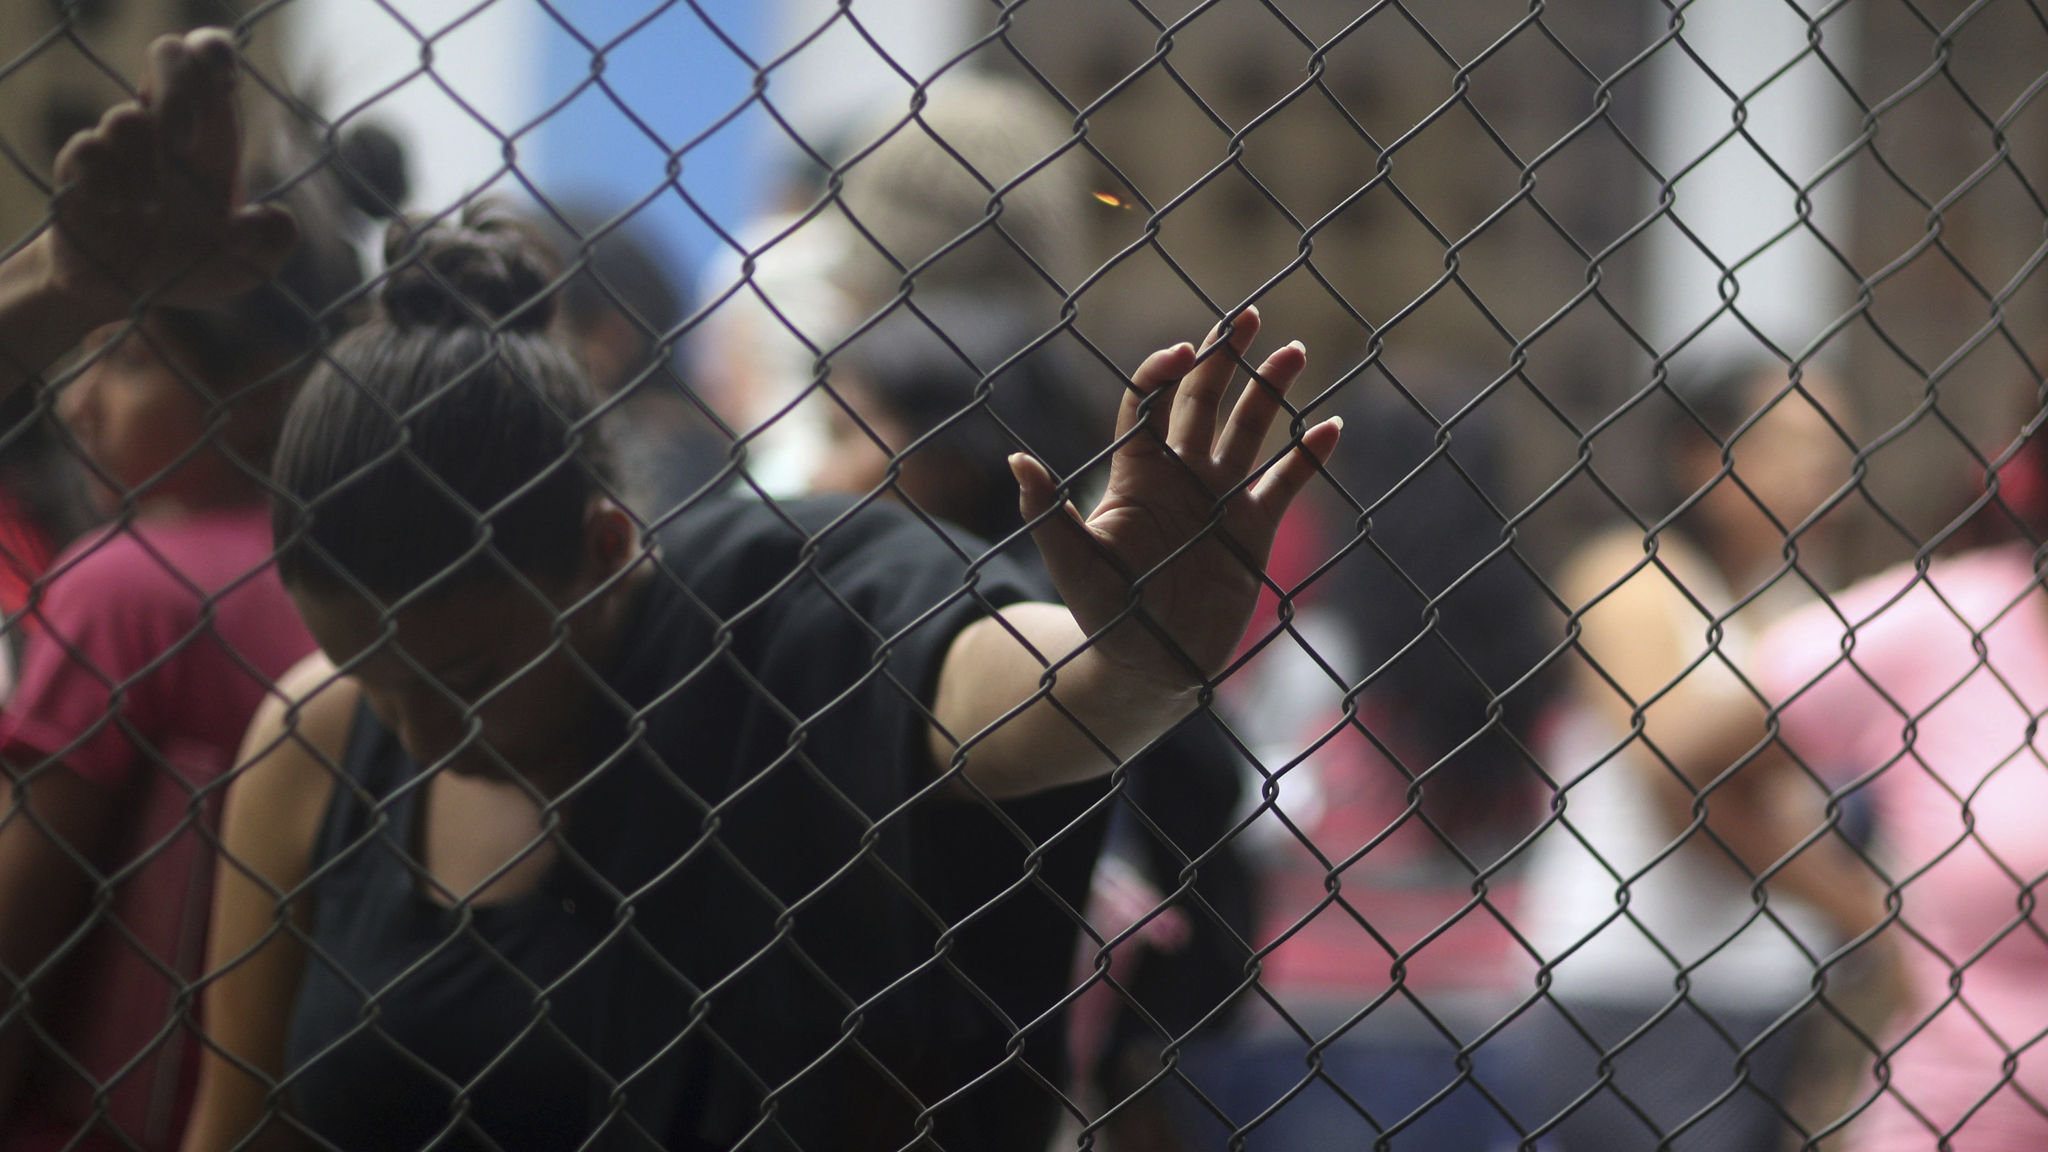 Venezuelan refugee exodus intensifies